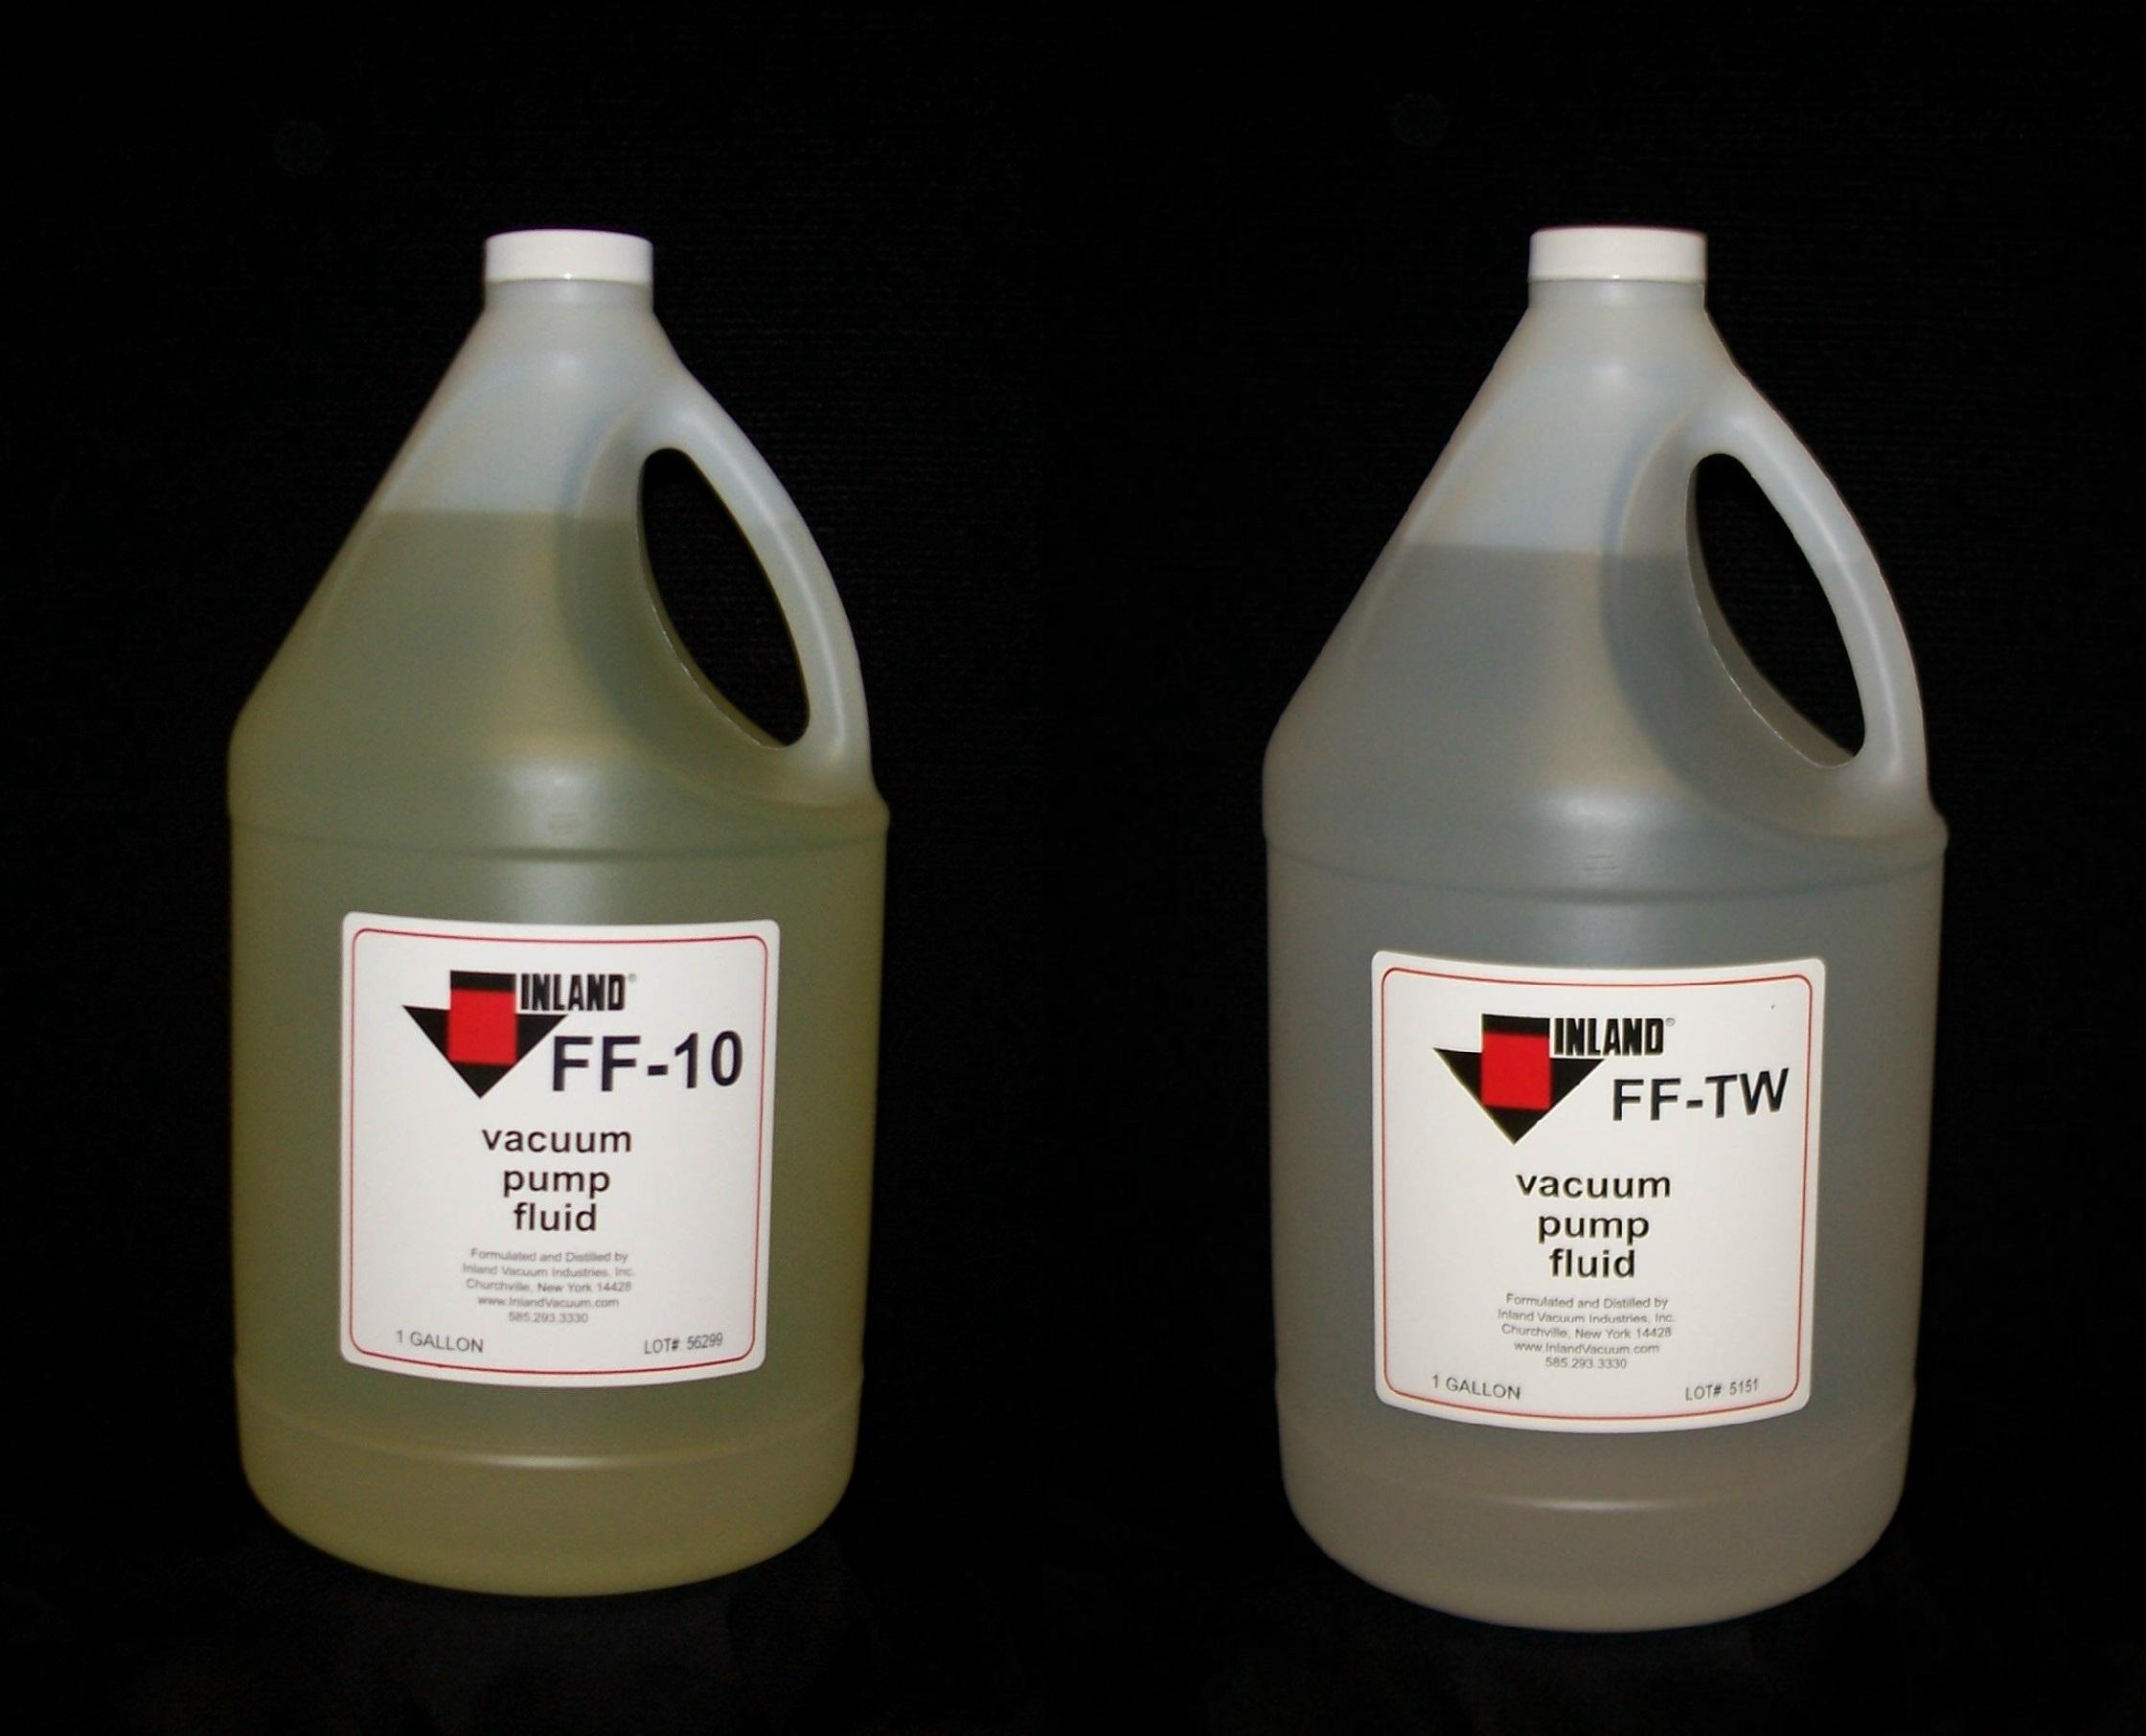 Vacuum Pump Preventative Maintenance Products Inland